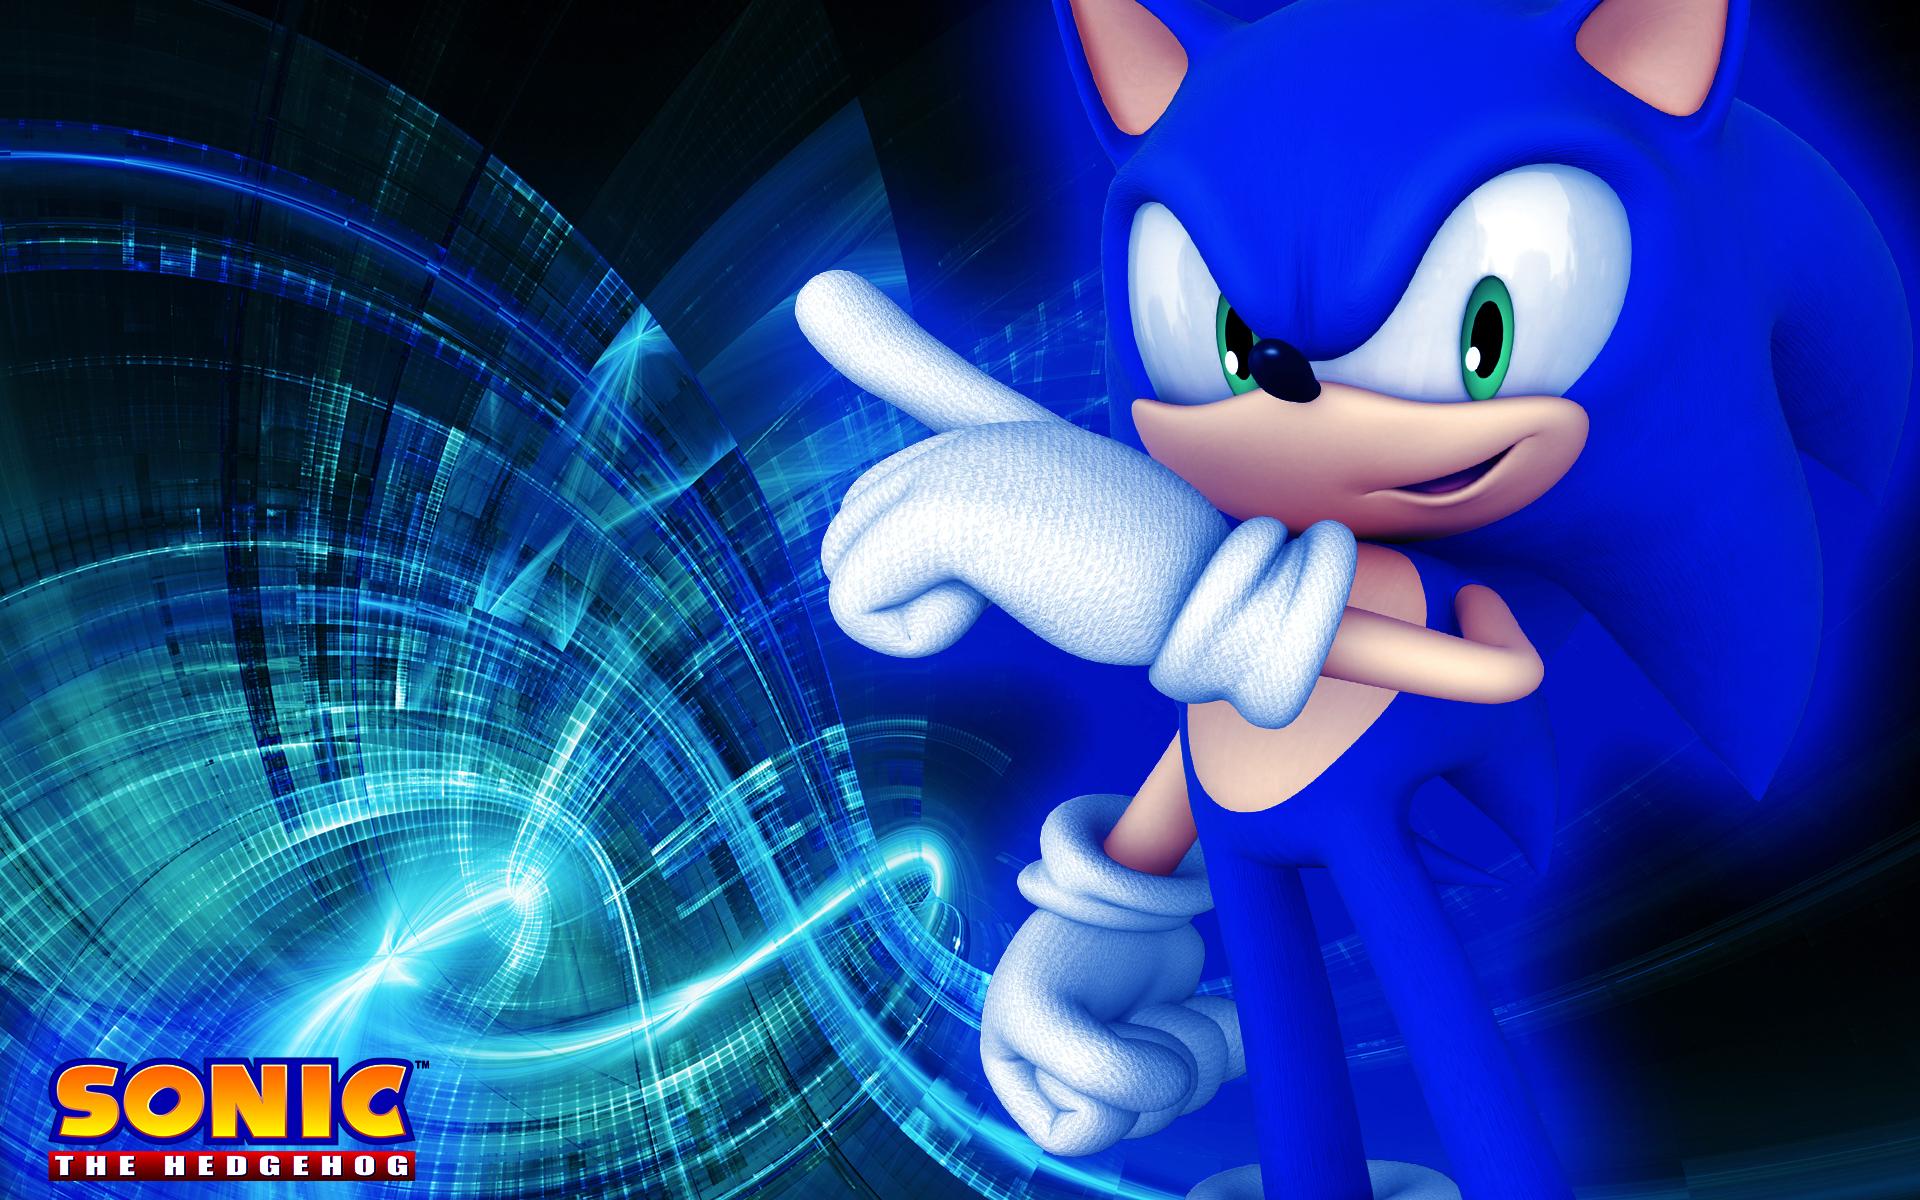 77 Sonic The Hedgehog Wallpaper On Wallpapersafari